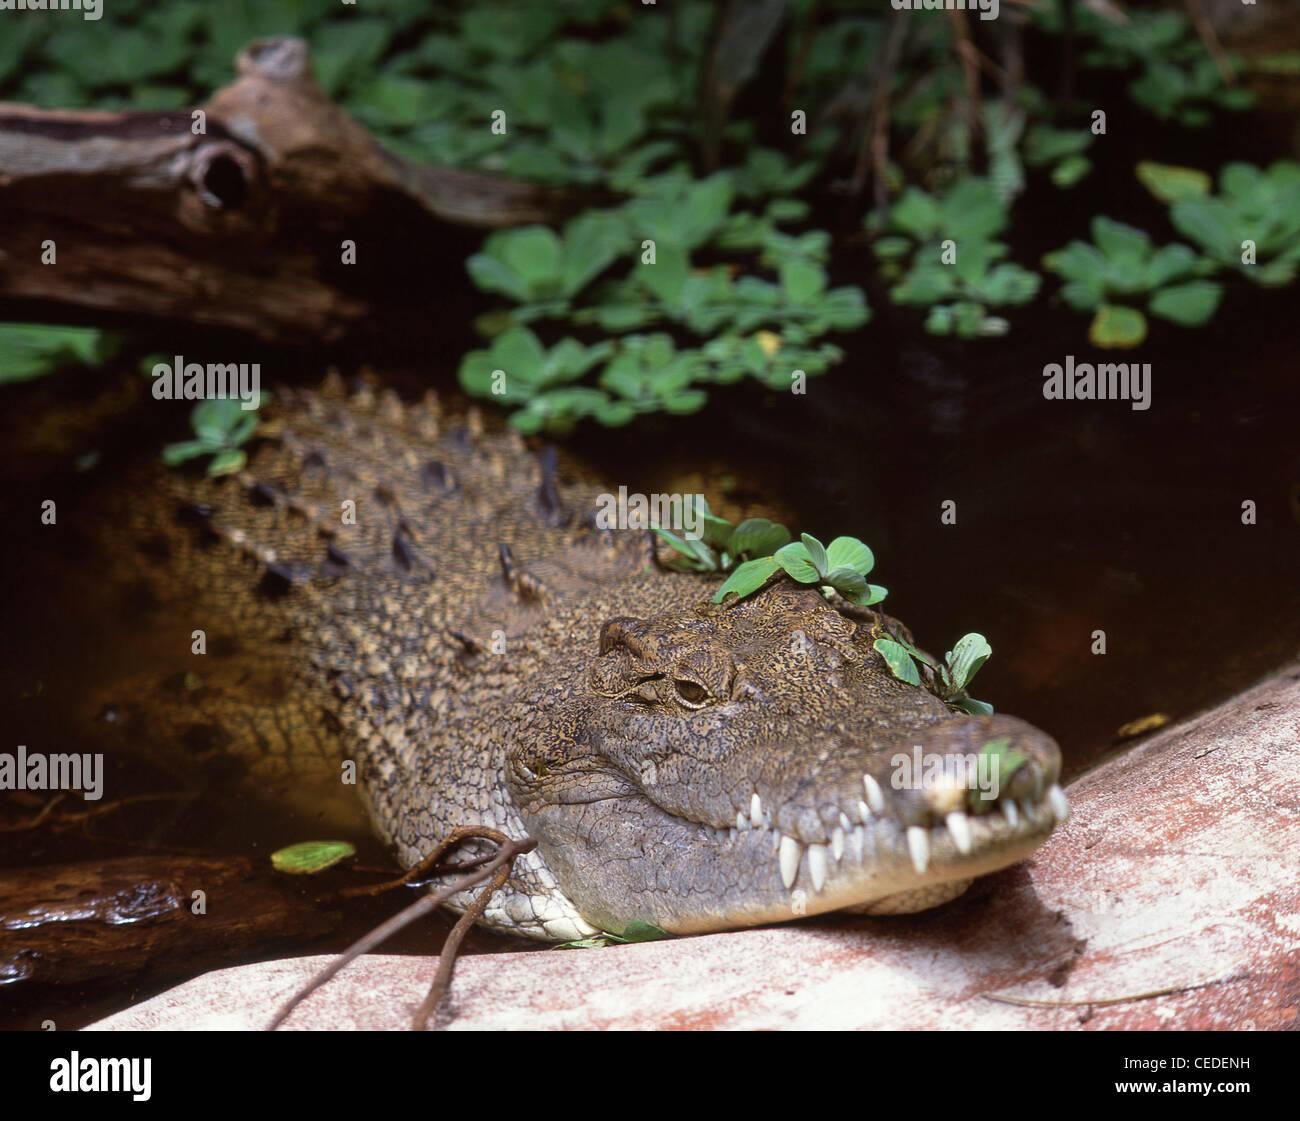 El cocodrilo descansando, Green Island, Great Barrier Reef Marine Park, Queensland, Australia Foto de stock